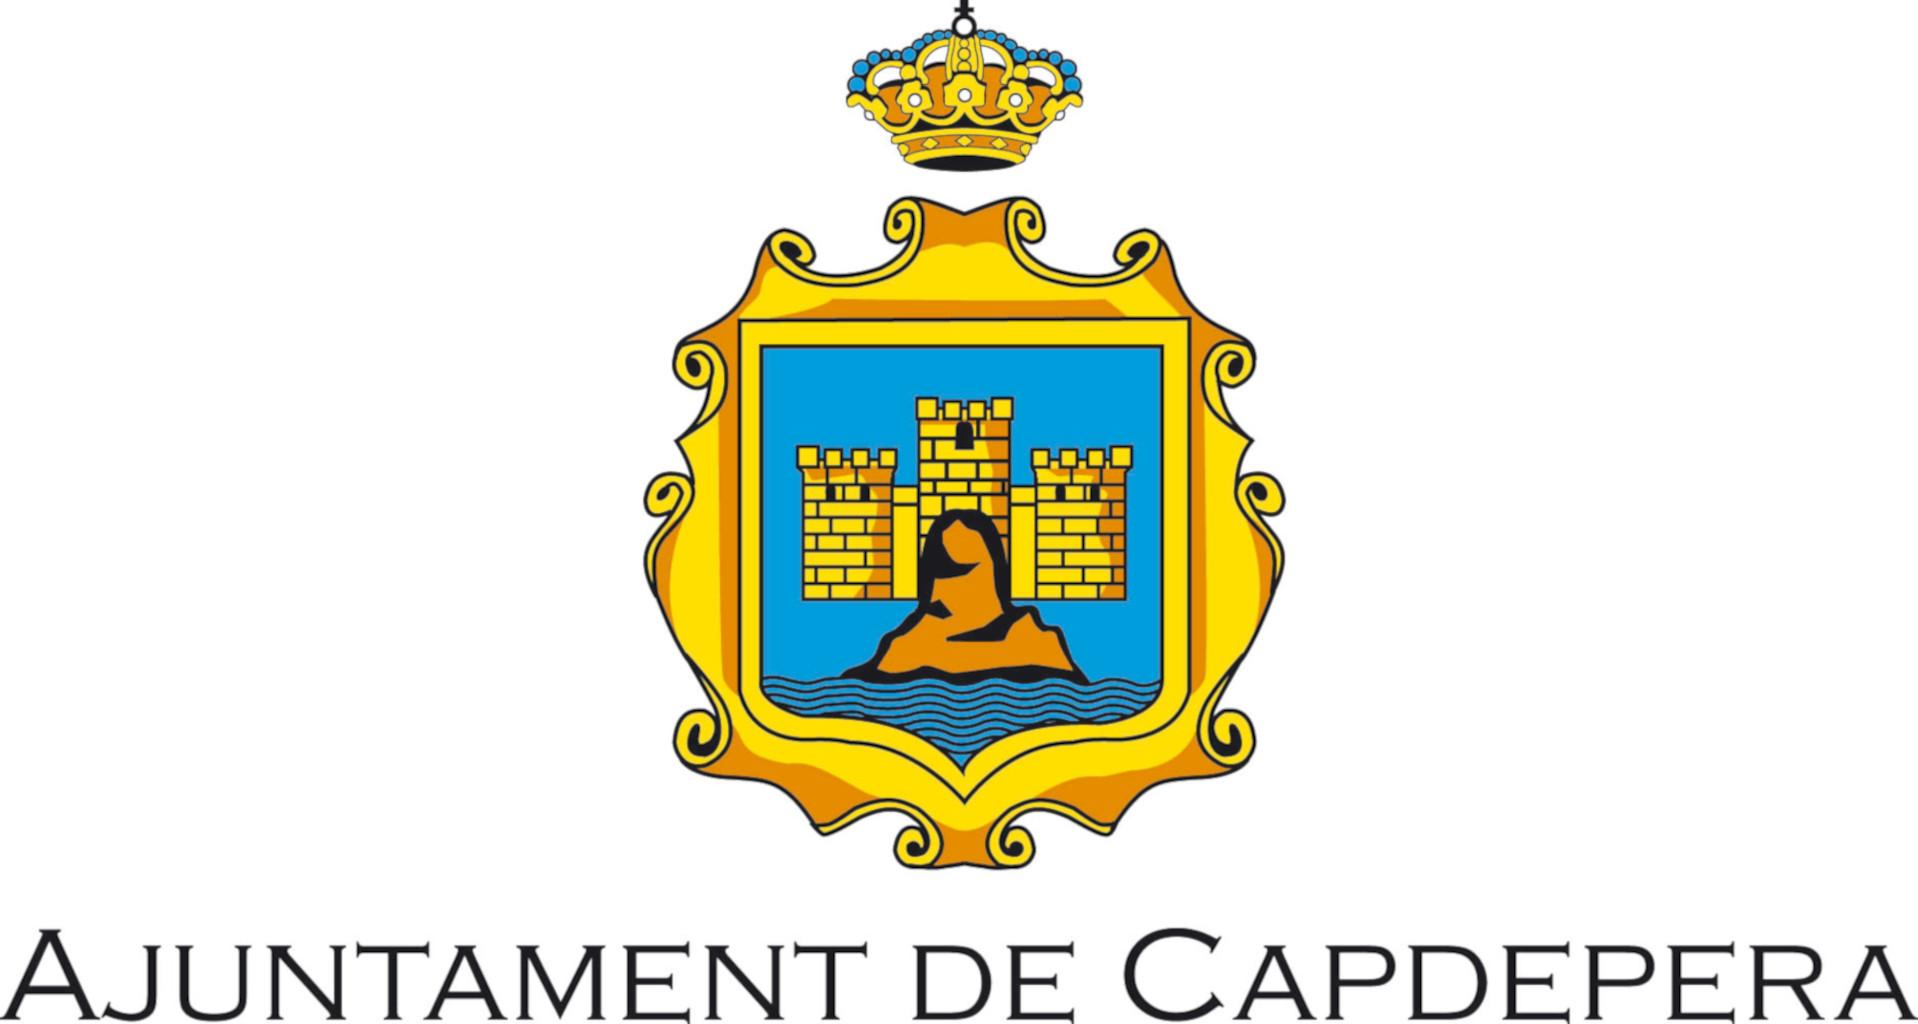 Capdepera